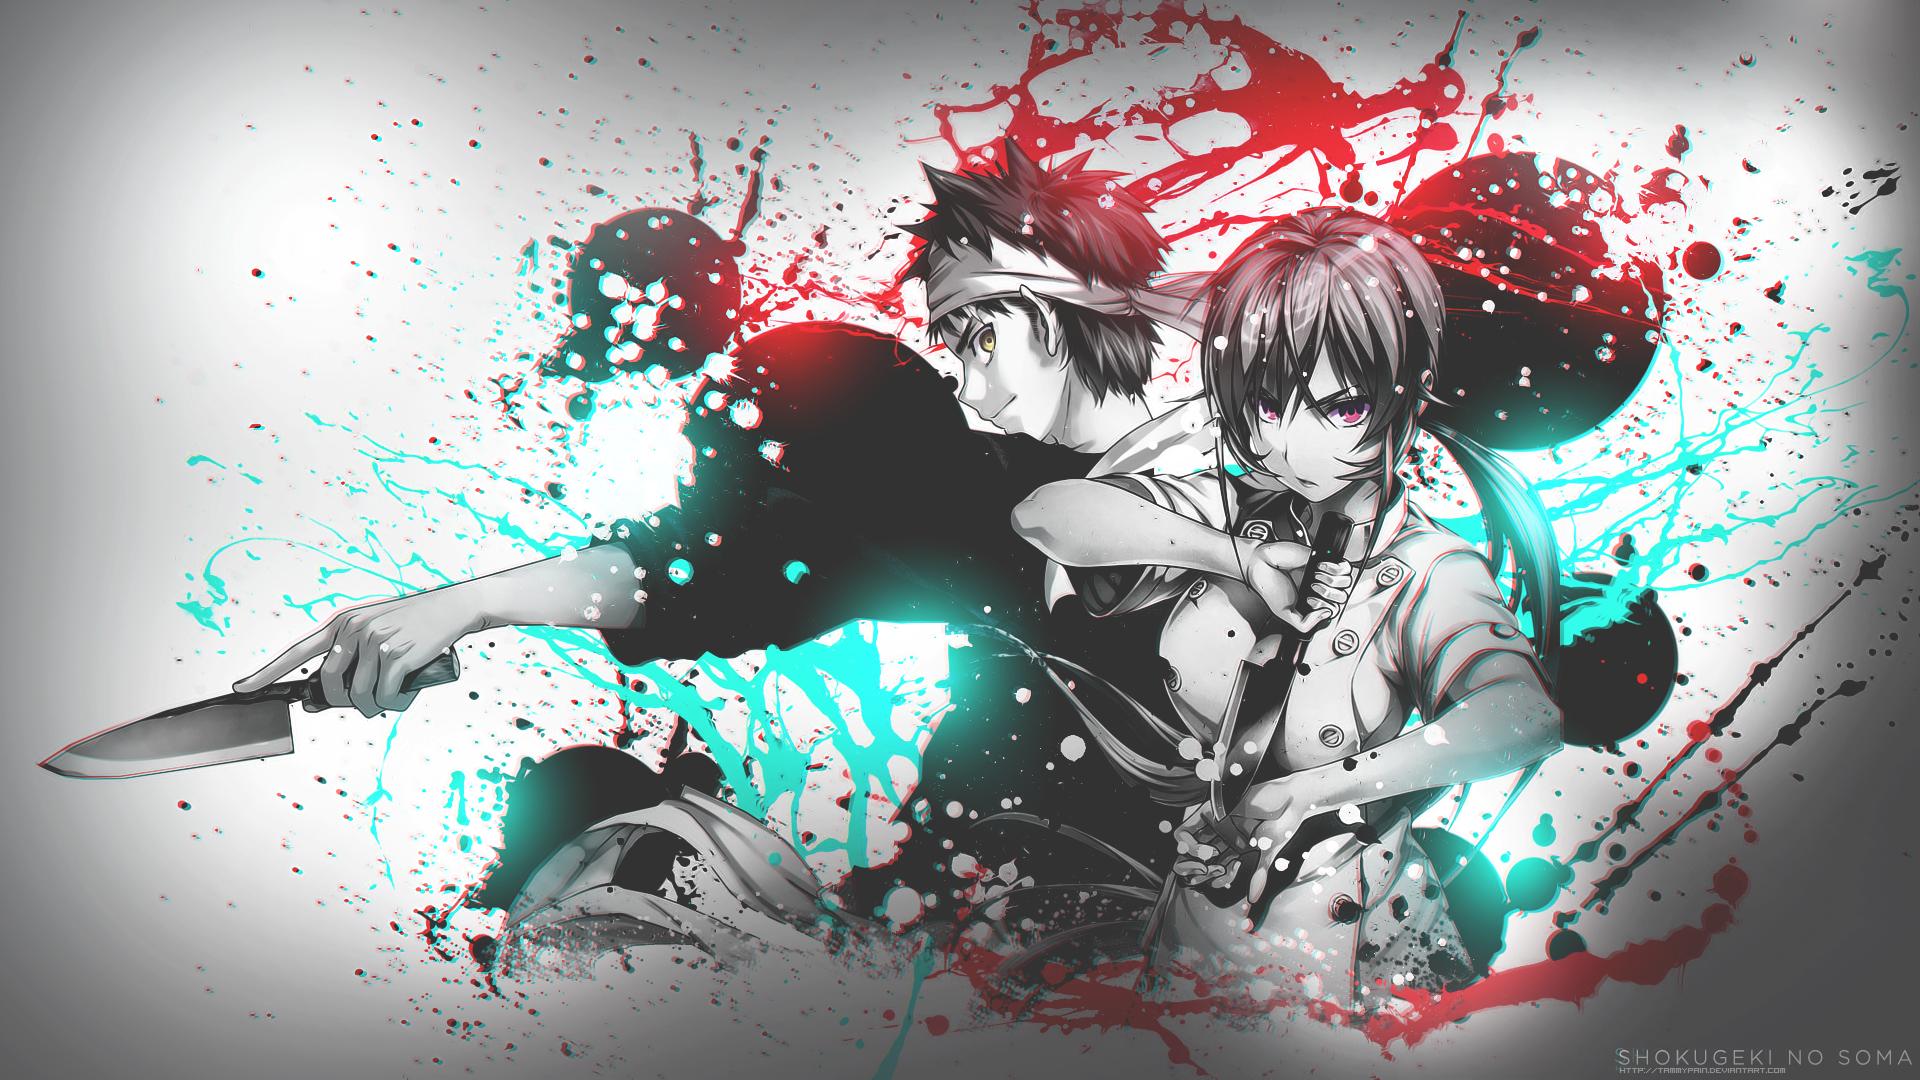 Erina and soma shokugeki no soma hd wallpaper - Anime war wallpaper ...